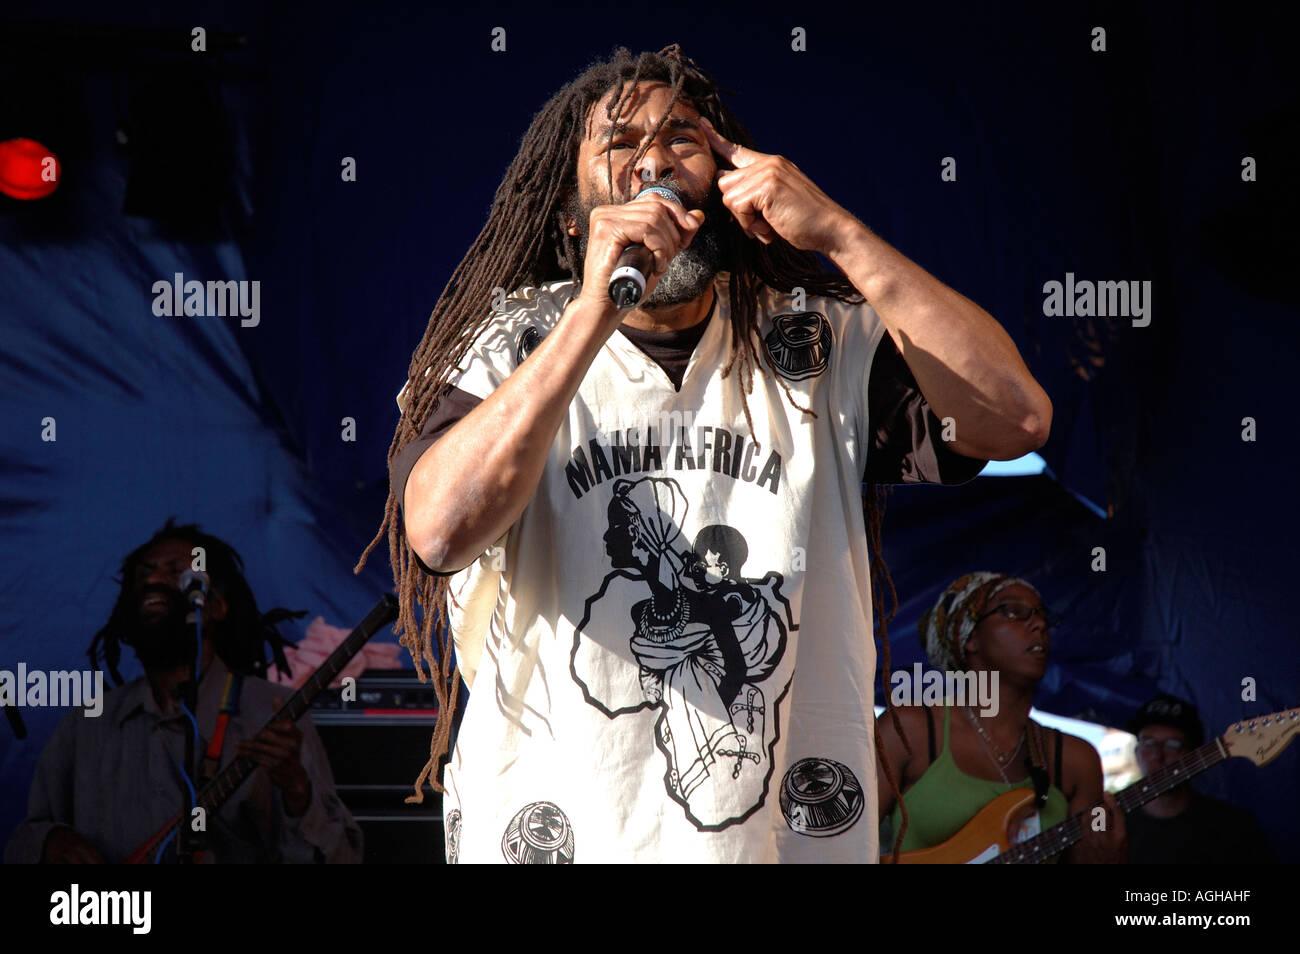 Rastafarian musician playing concert Reggae  at Lambeth Country Fair in brockwell Park South London. - Stock Image